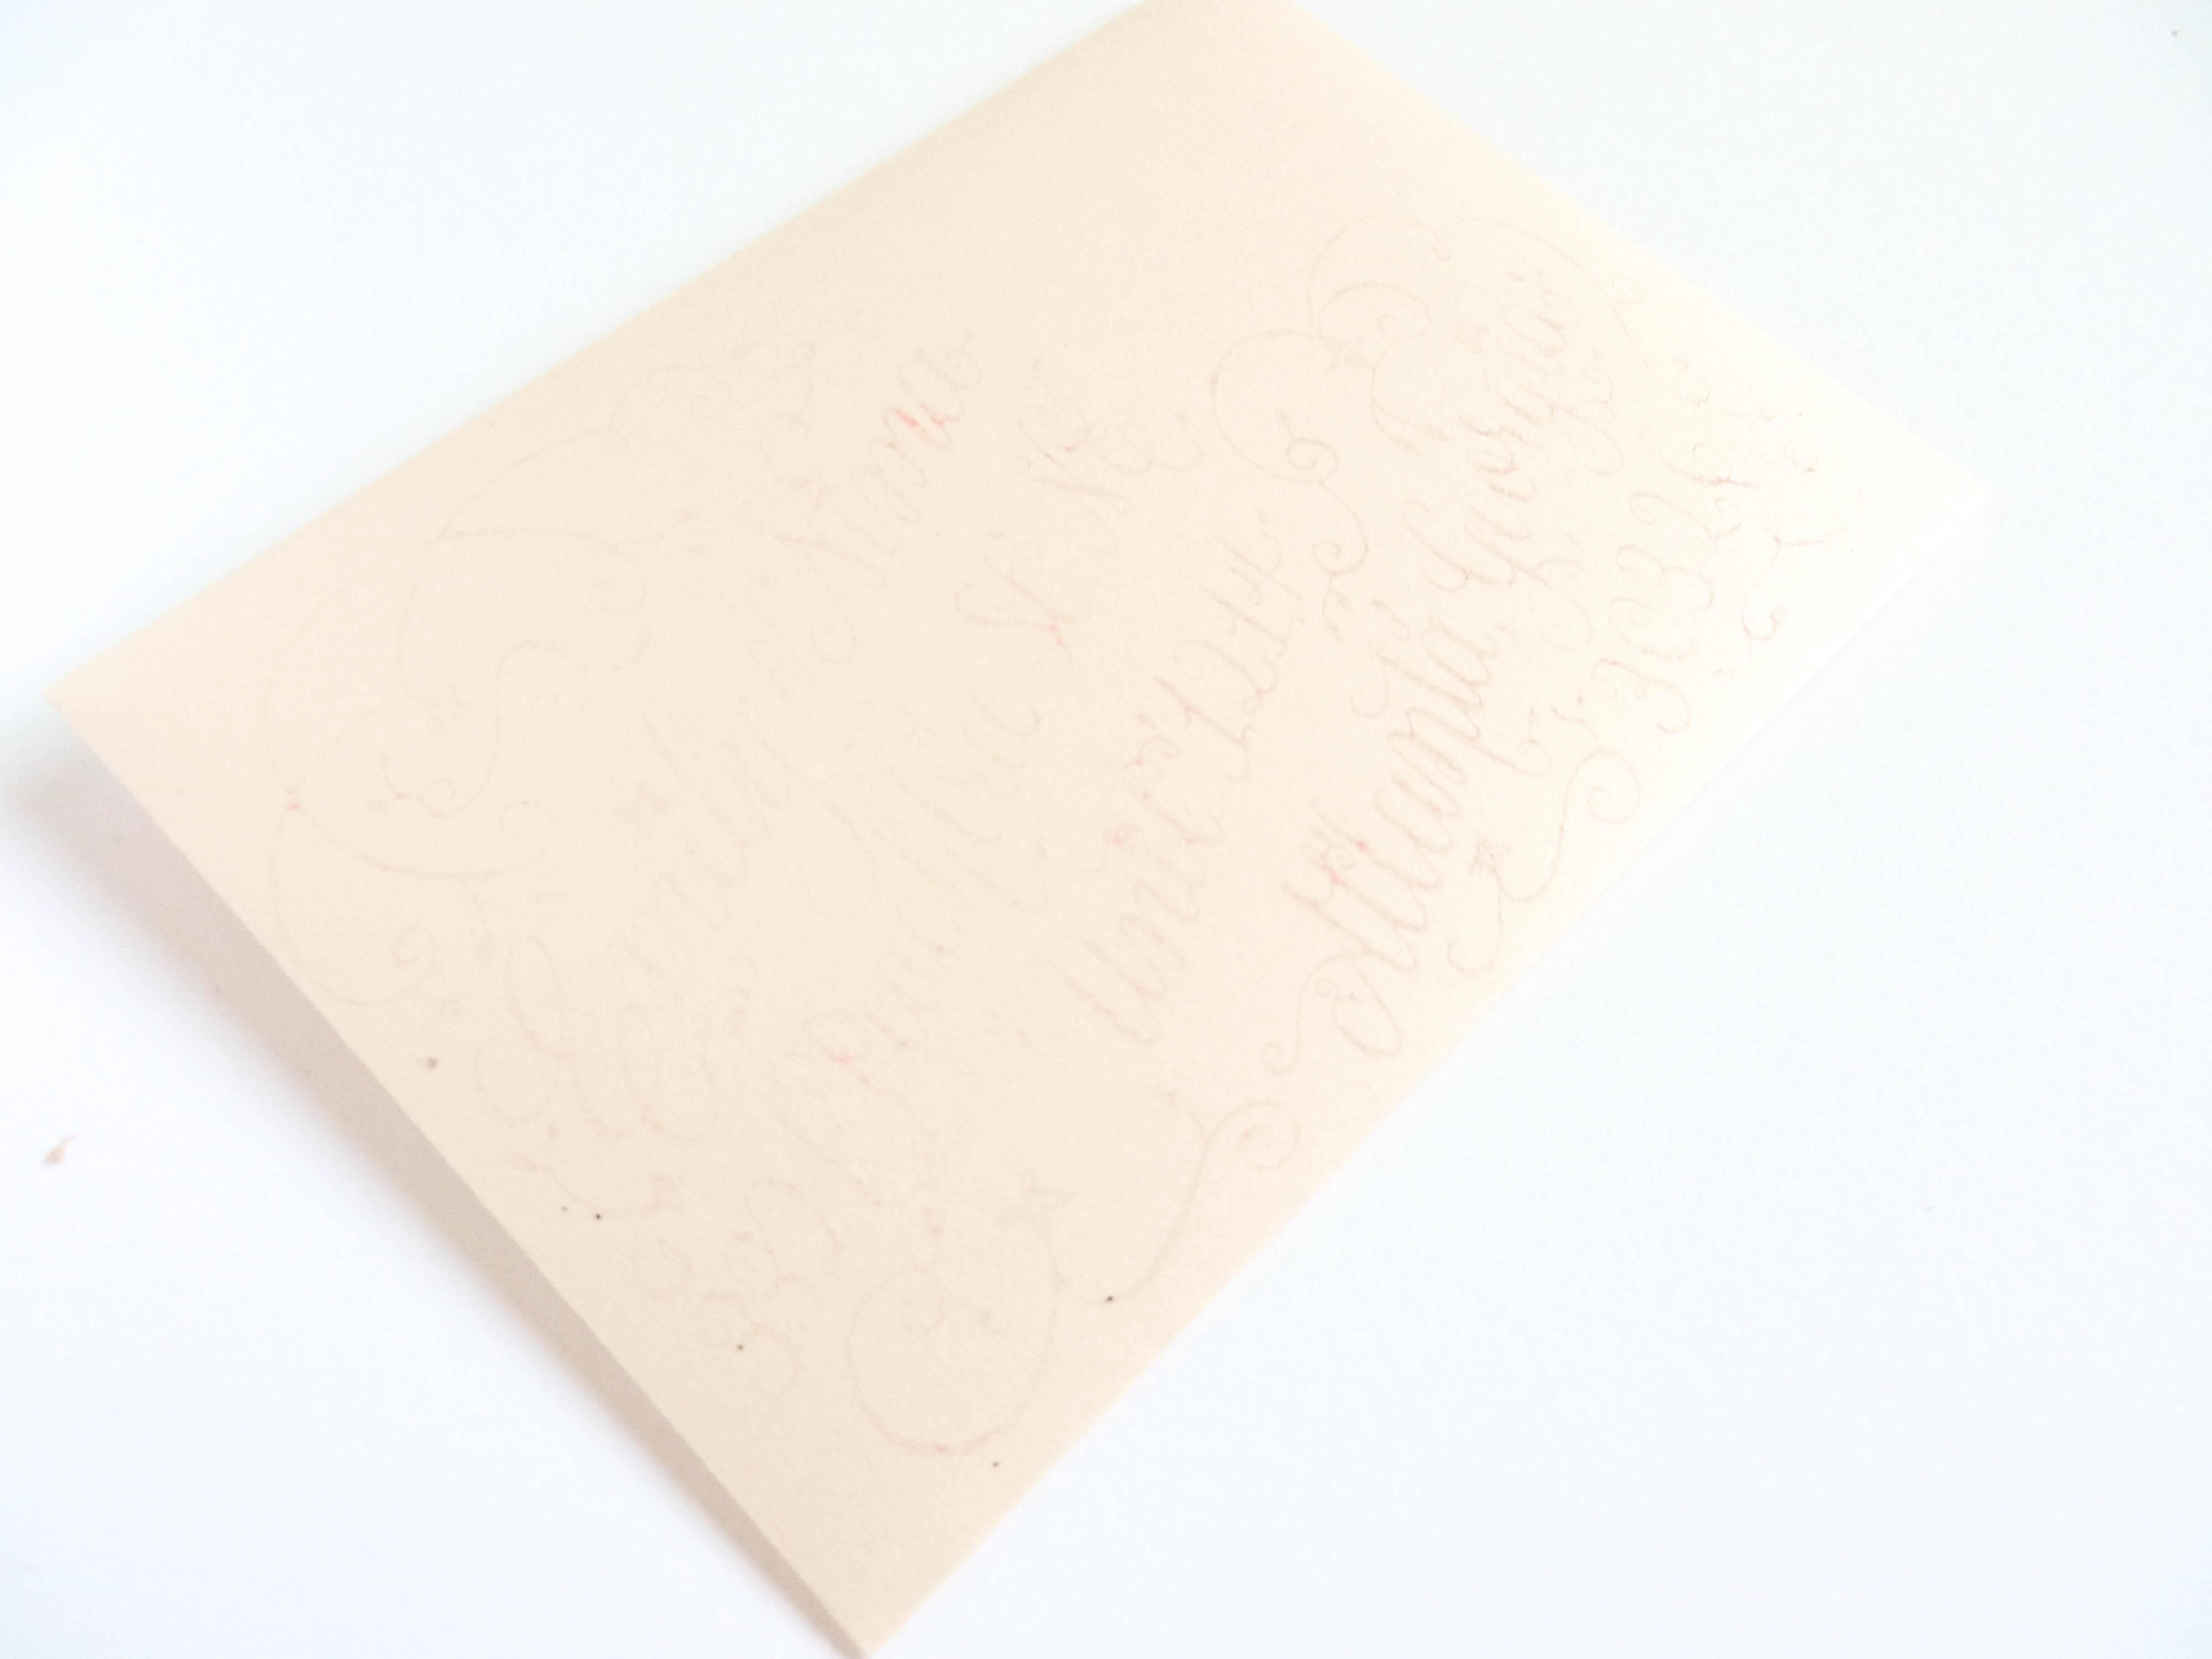 How to Heat Emboss | The Postman's Knock